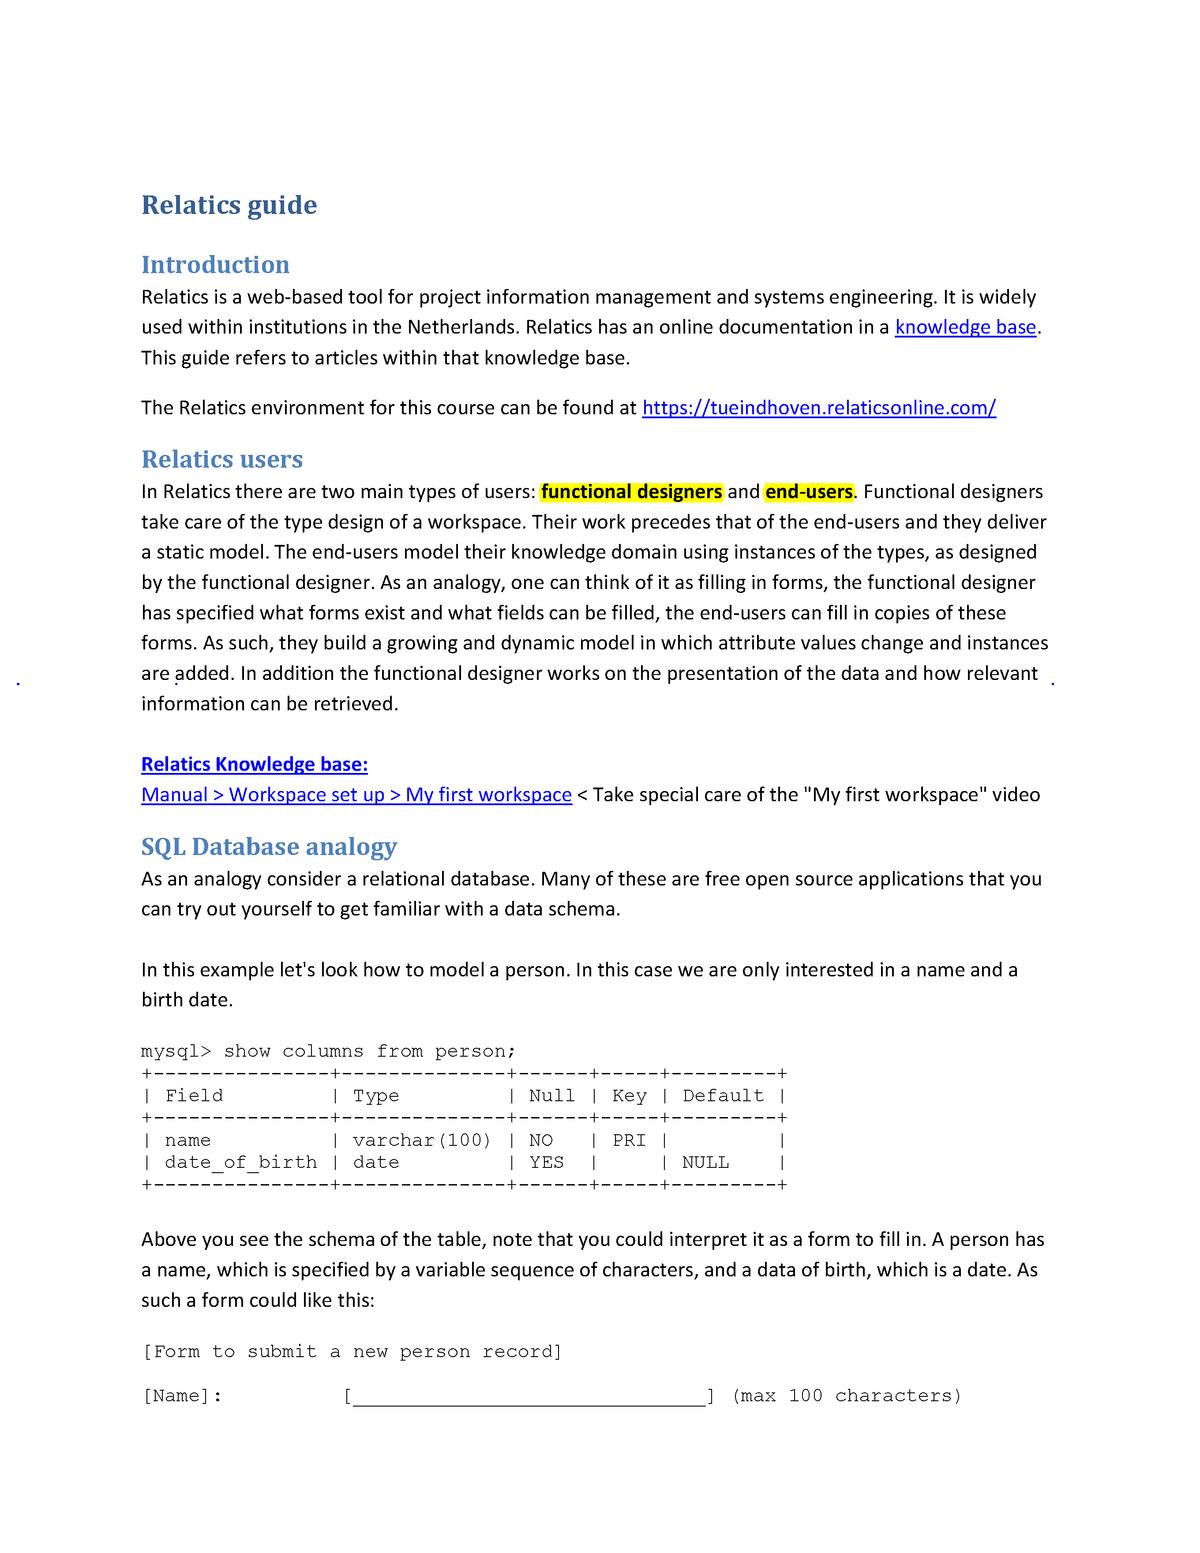 Relatics guide - 7ZM9M0: Systems engineering - StuDocu